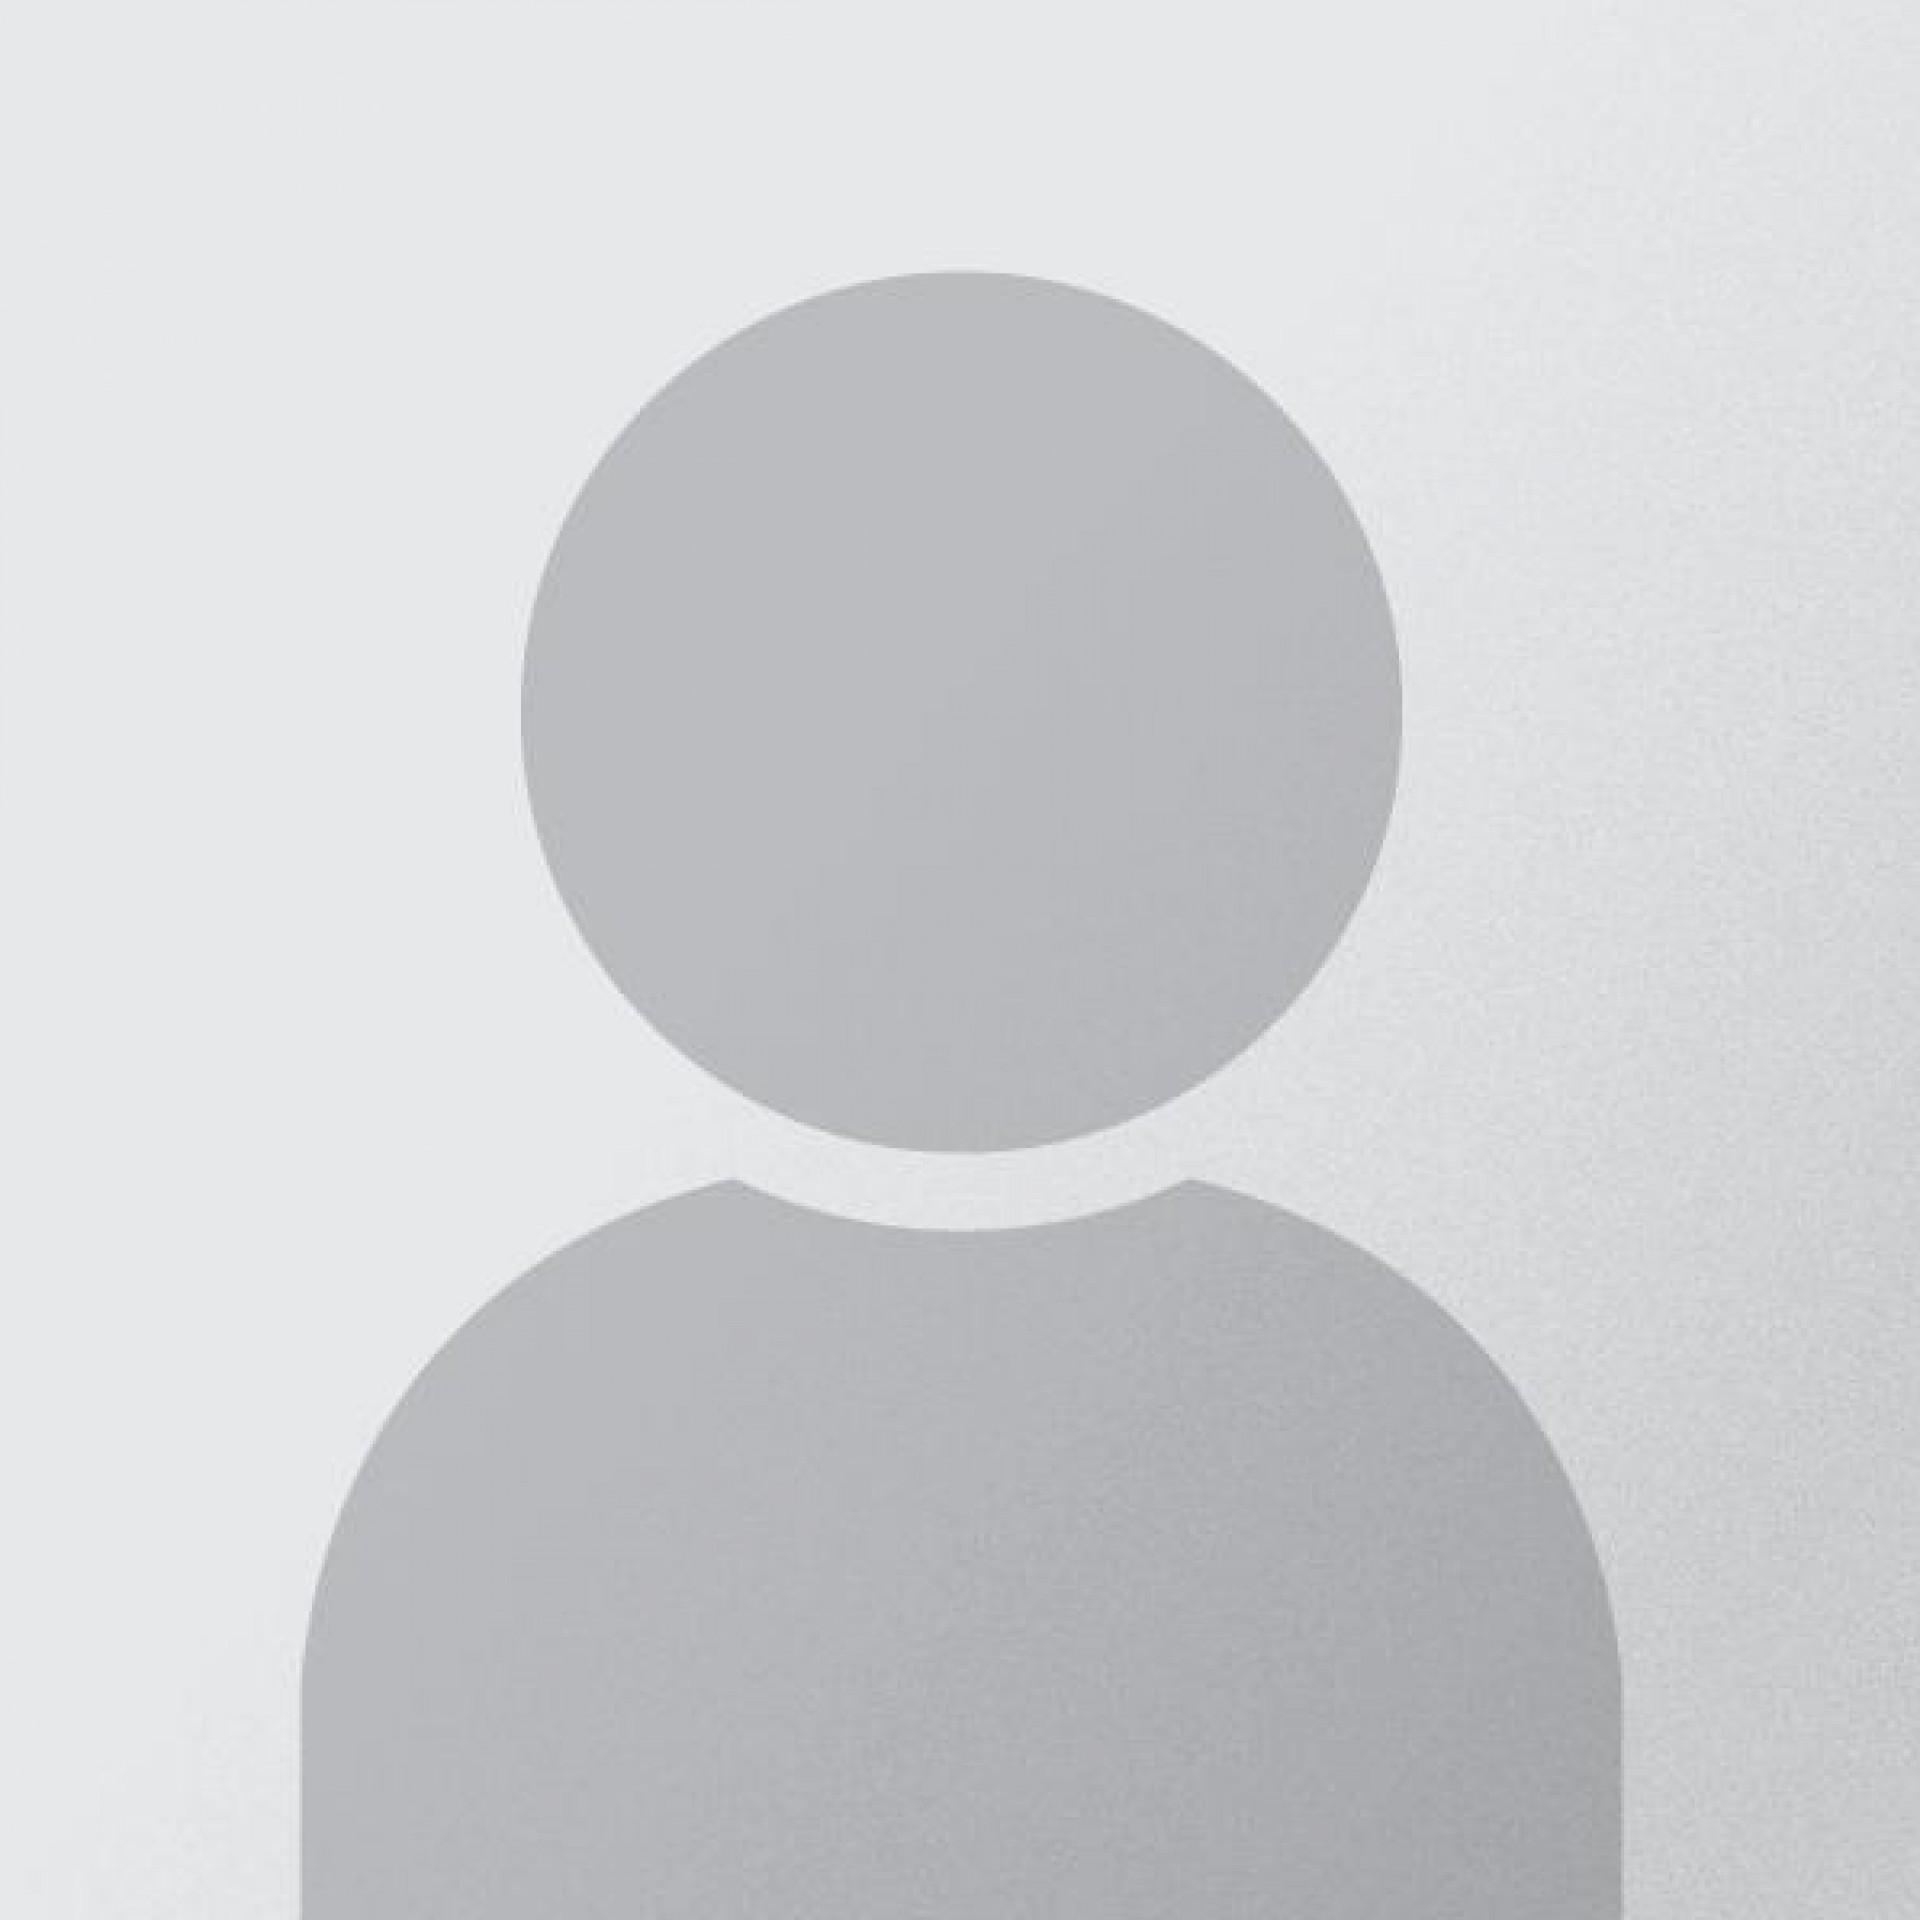 fotografia p031 profilu 01025M52MT